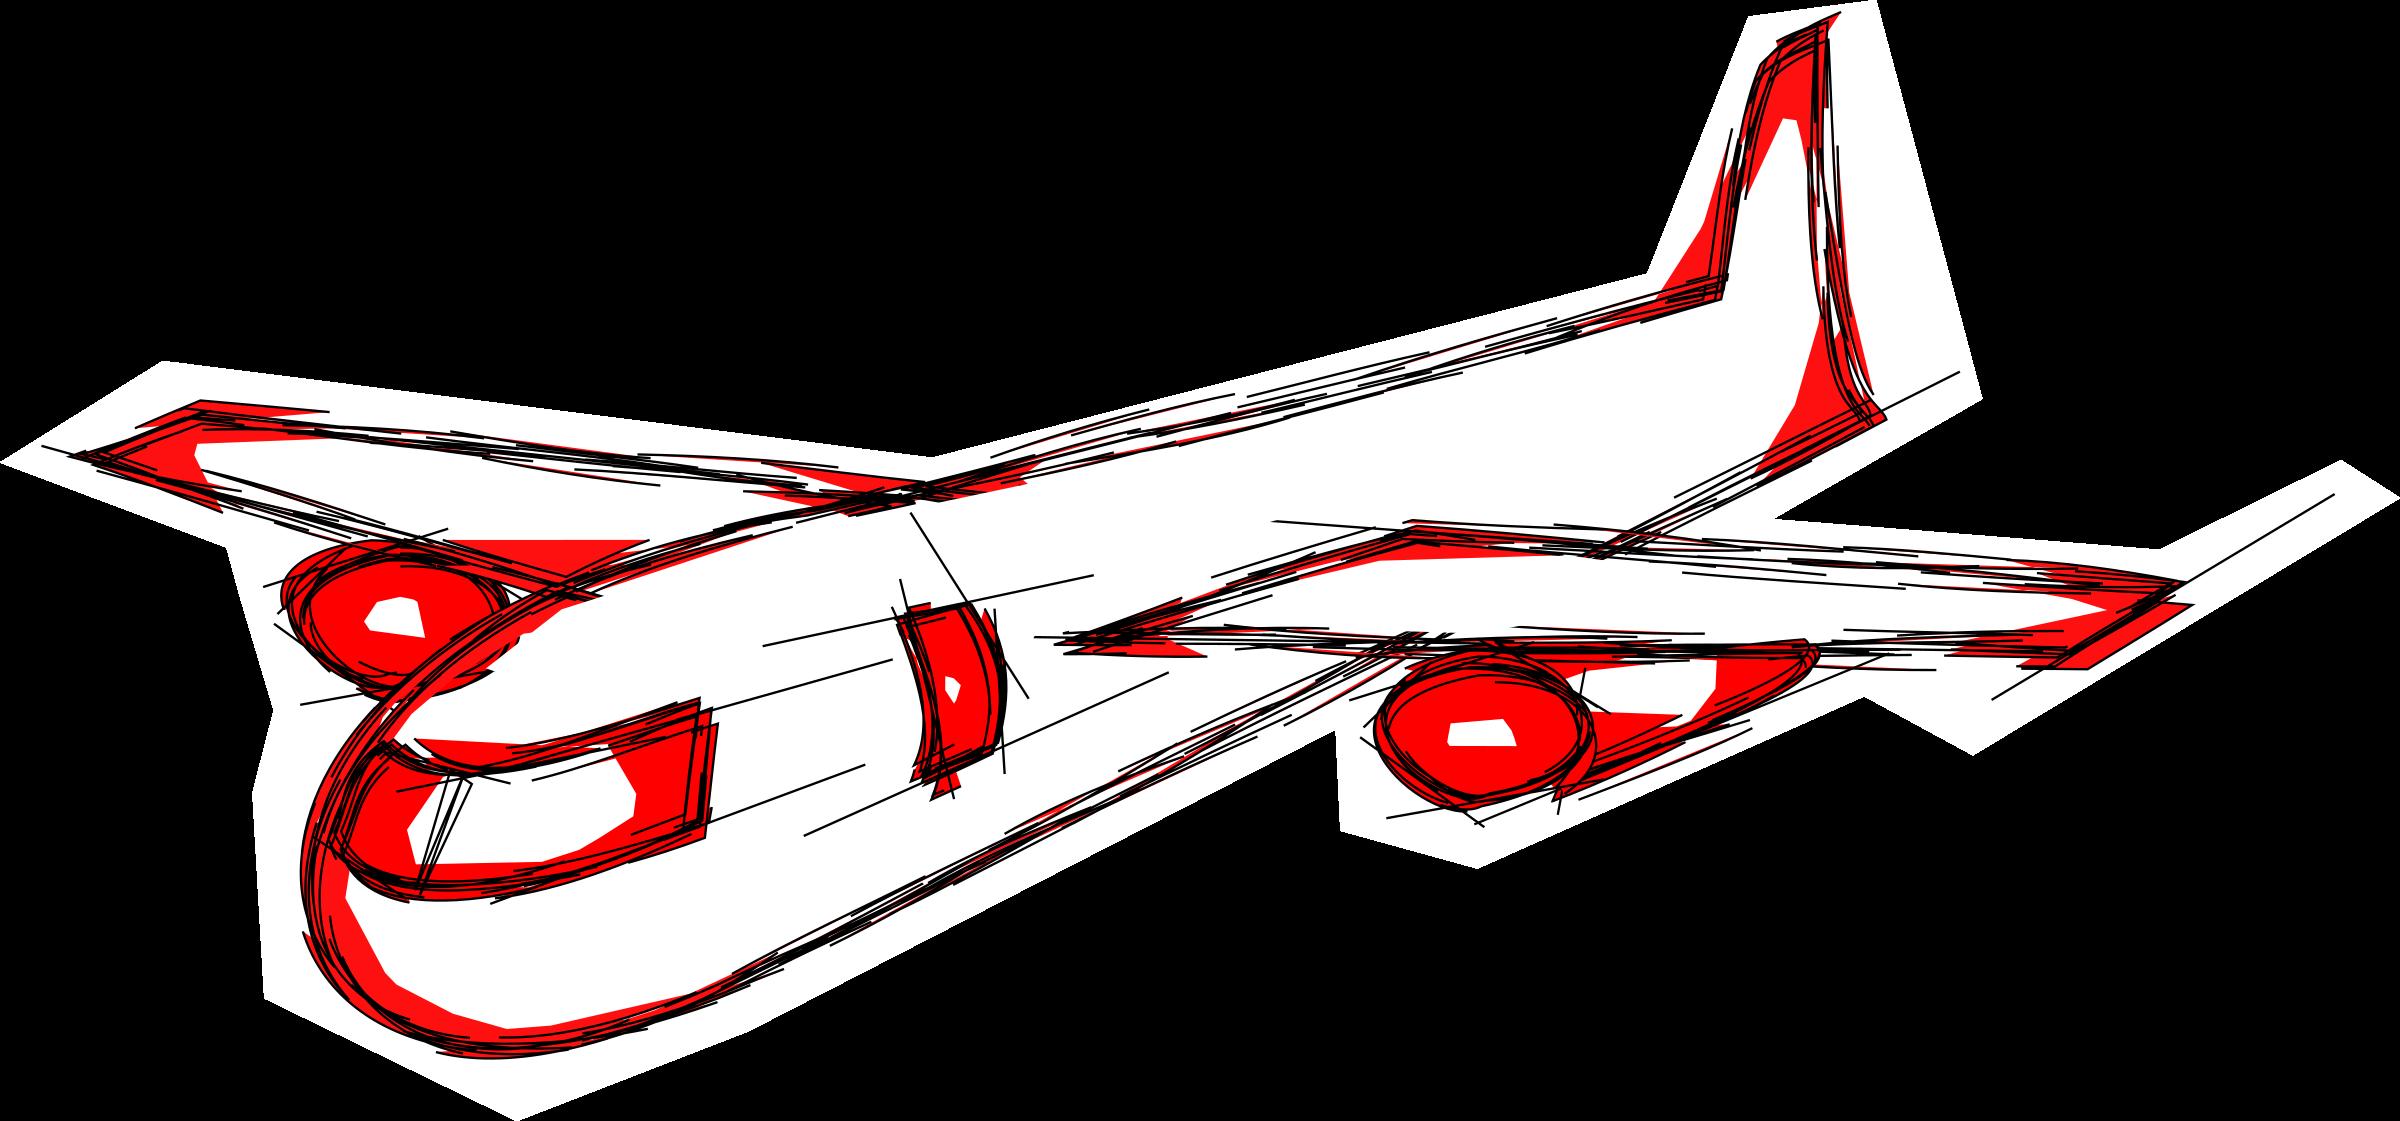 Clipart plane jetliner. Jumbo jet at getdrawings